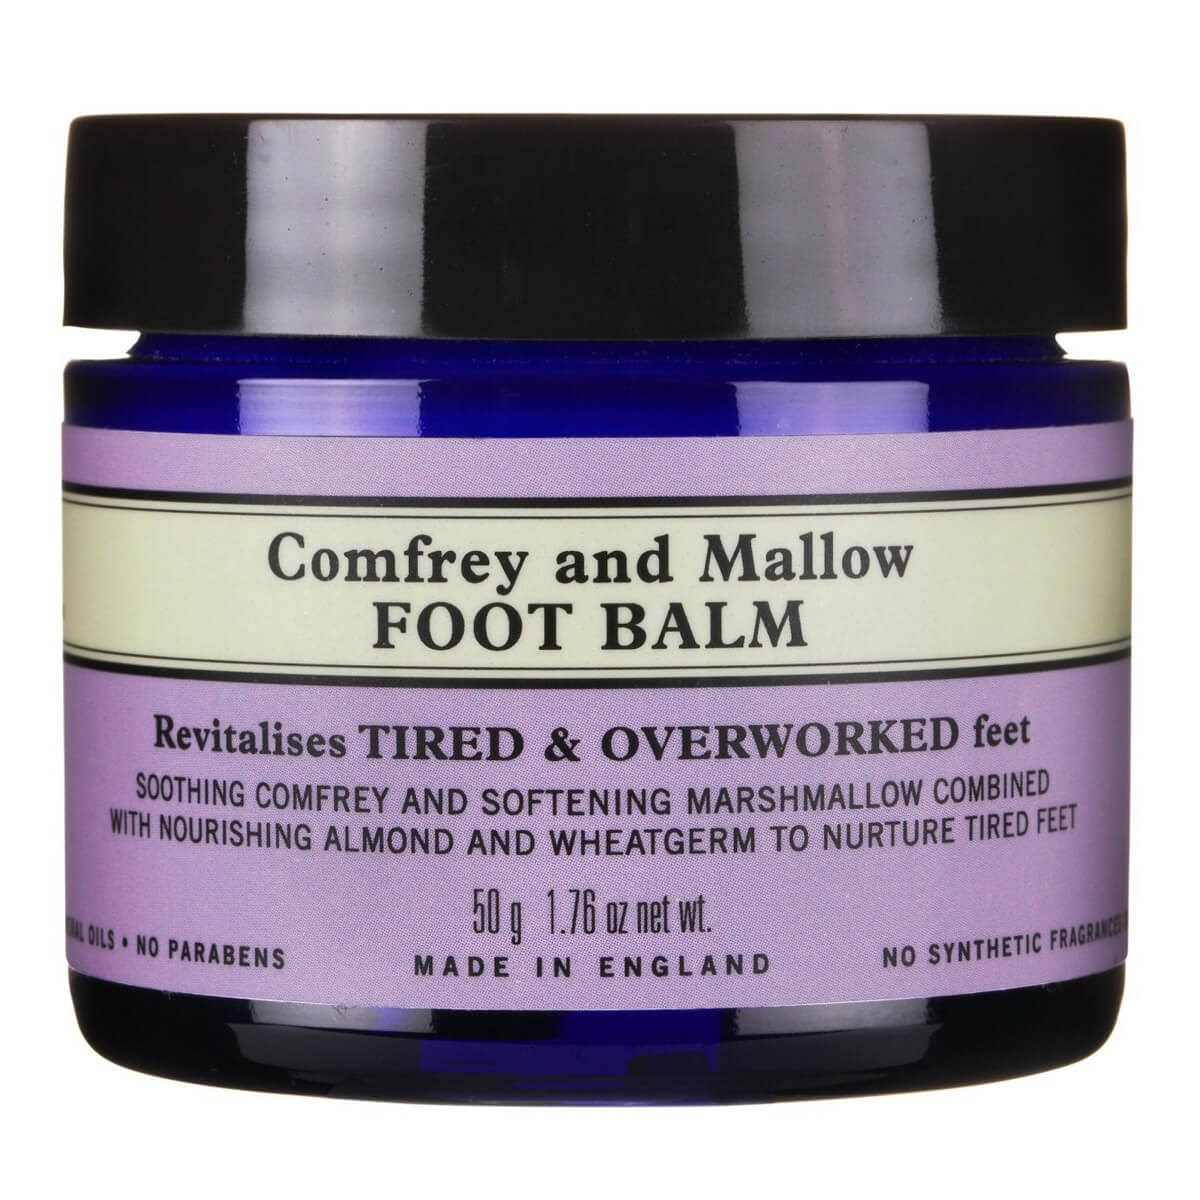 Neal's Yard Remedies Comfrey & Mallow Foot Balm